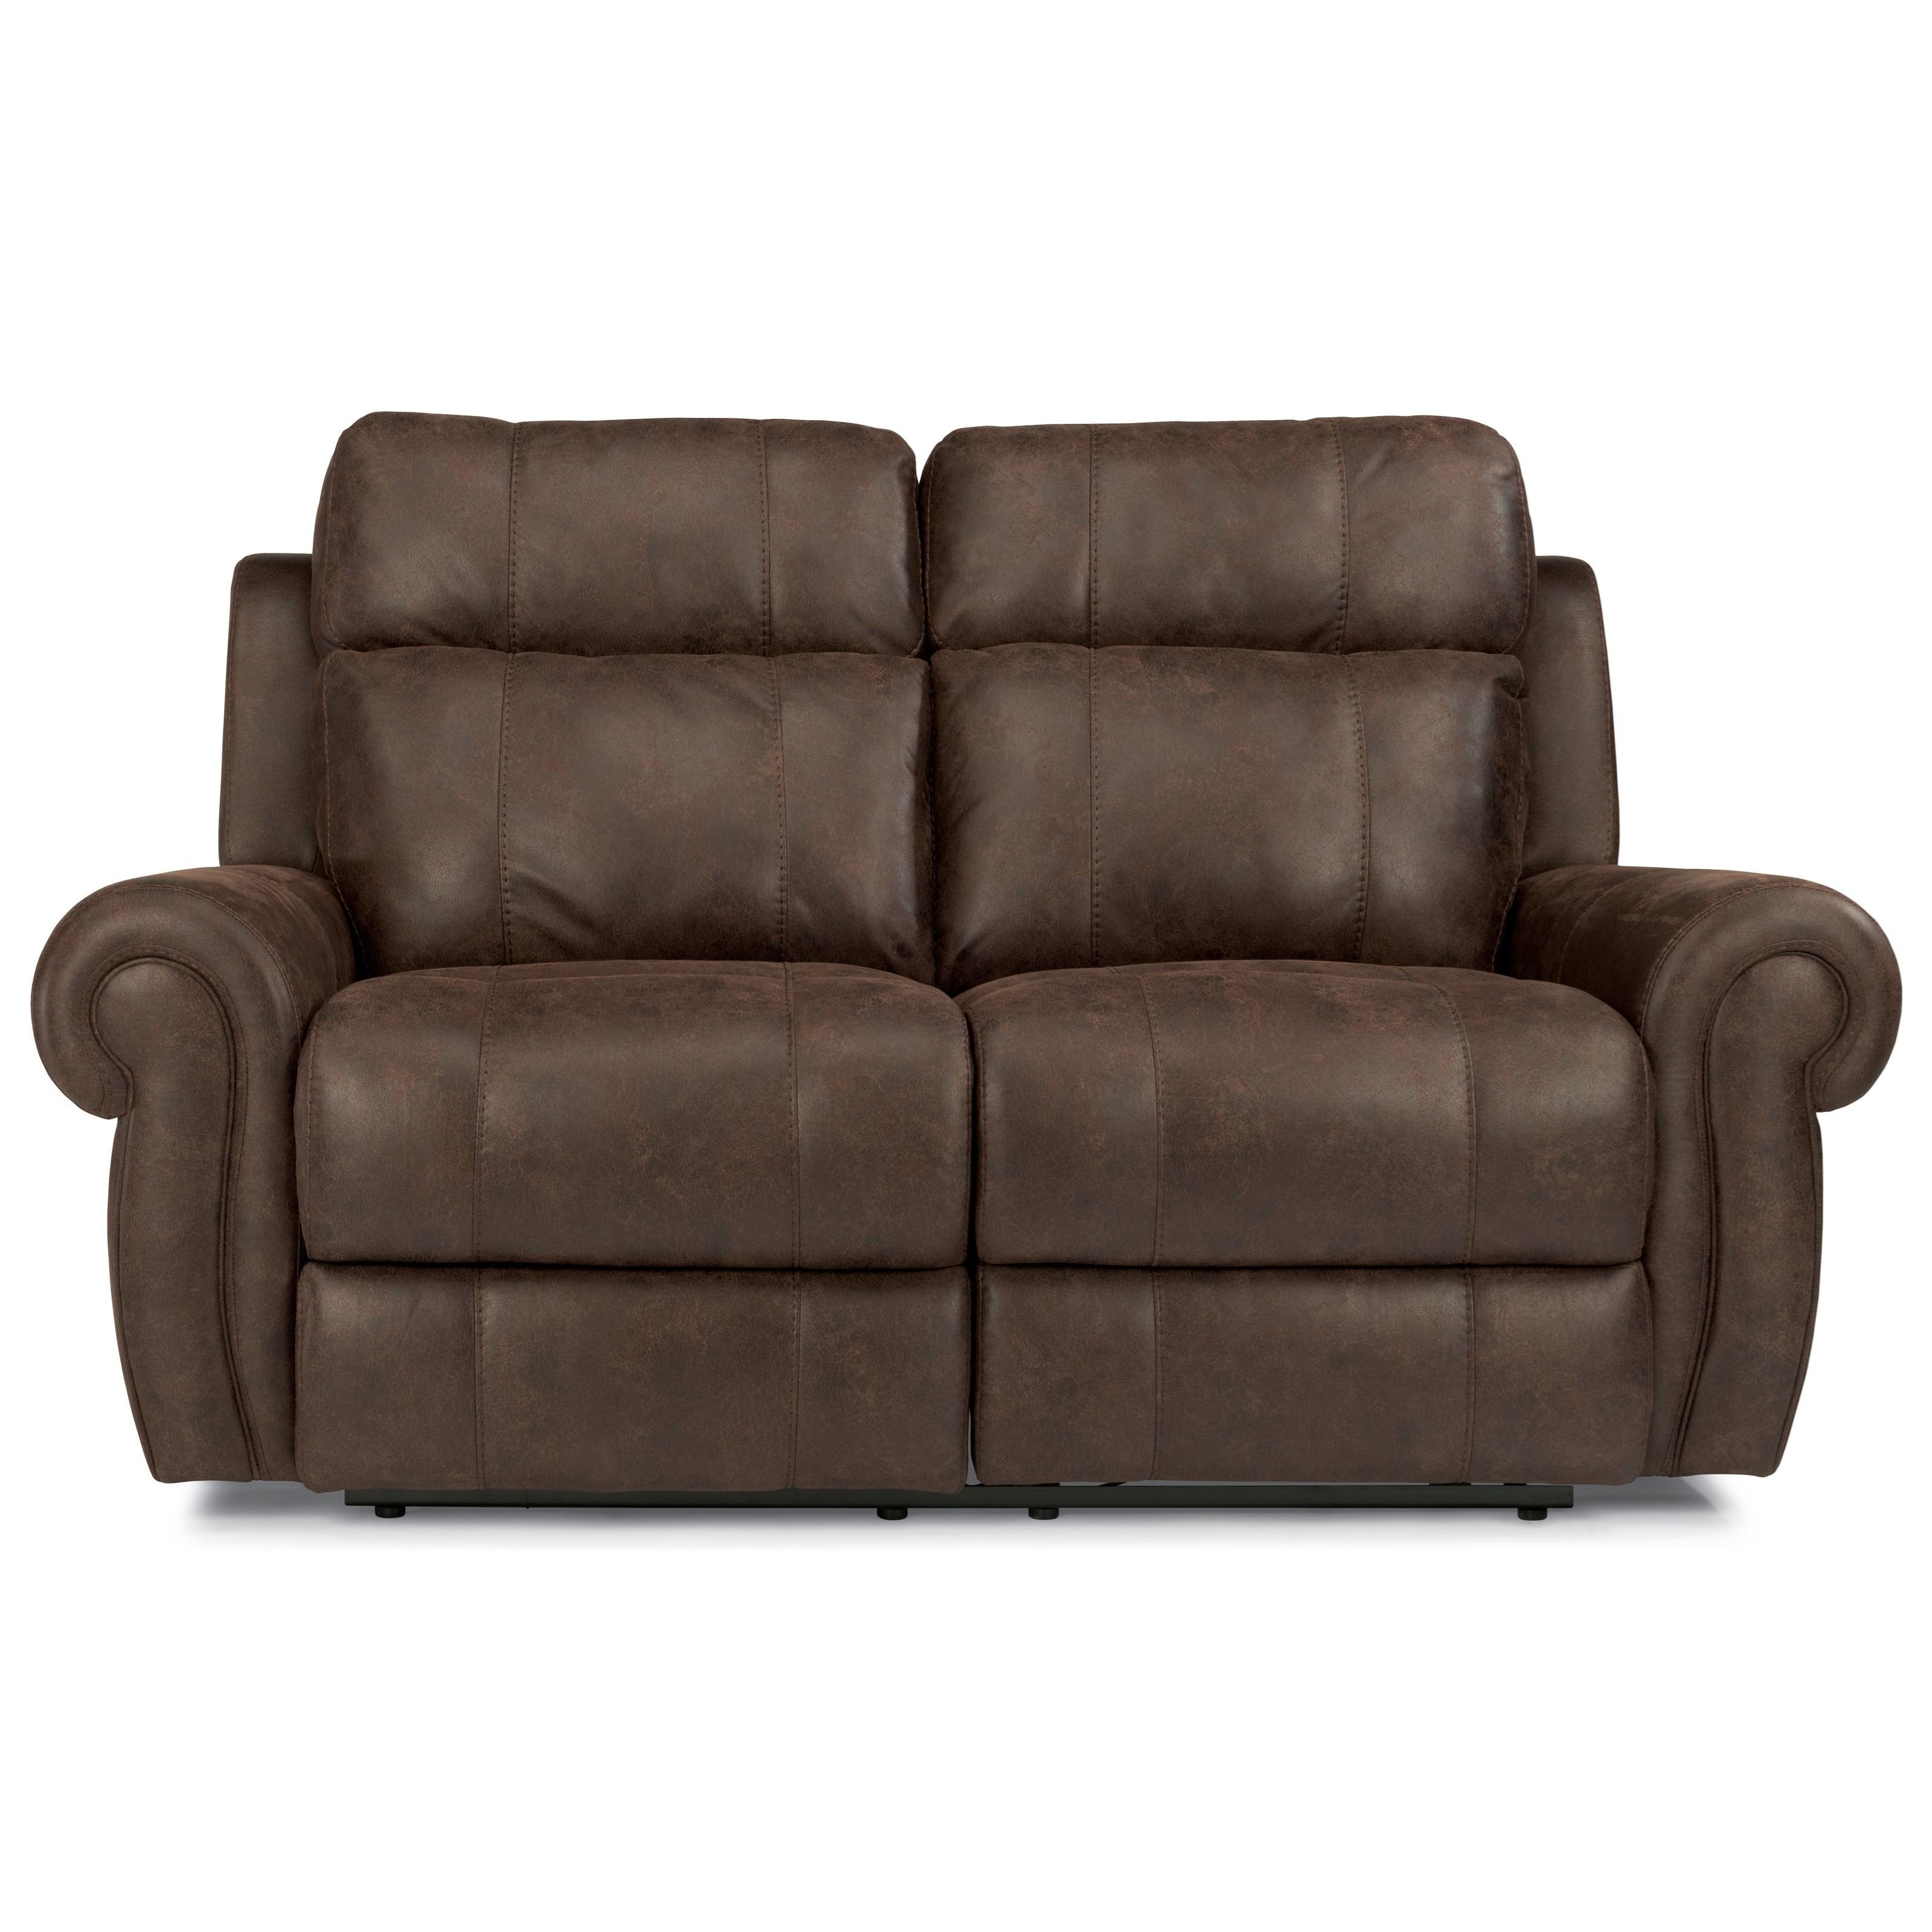 Flexsteel Latitudes-Forrest Power Reclining Love Seat - Item Number: 1346-60PH